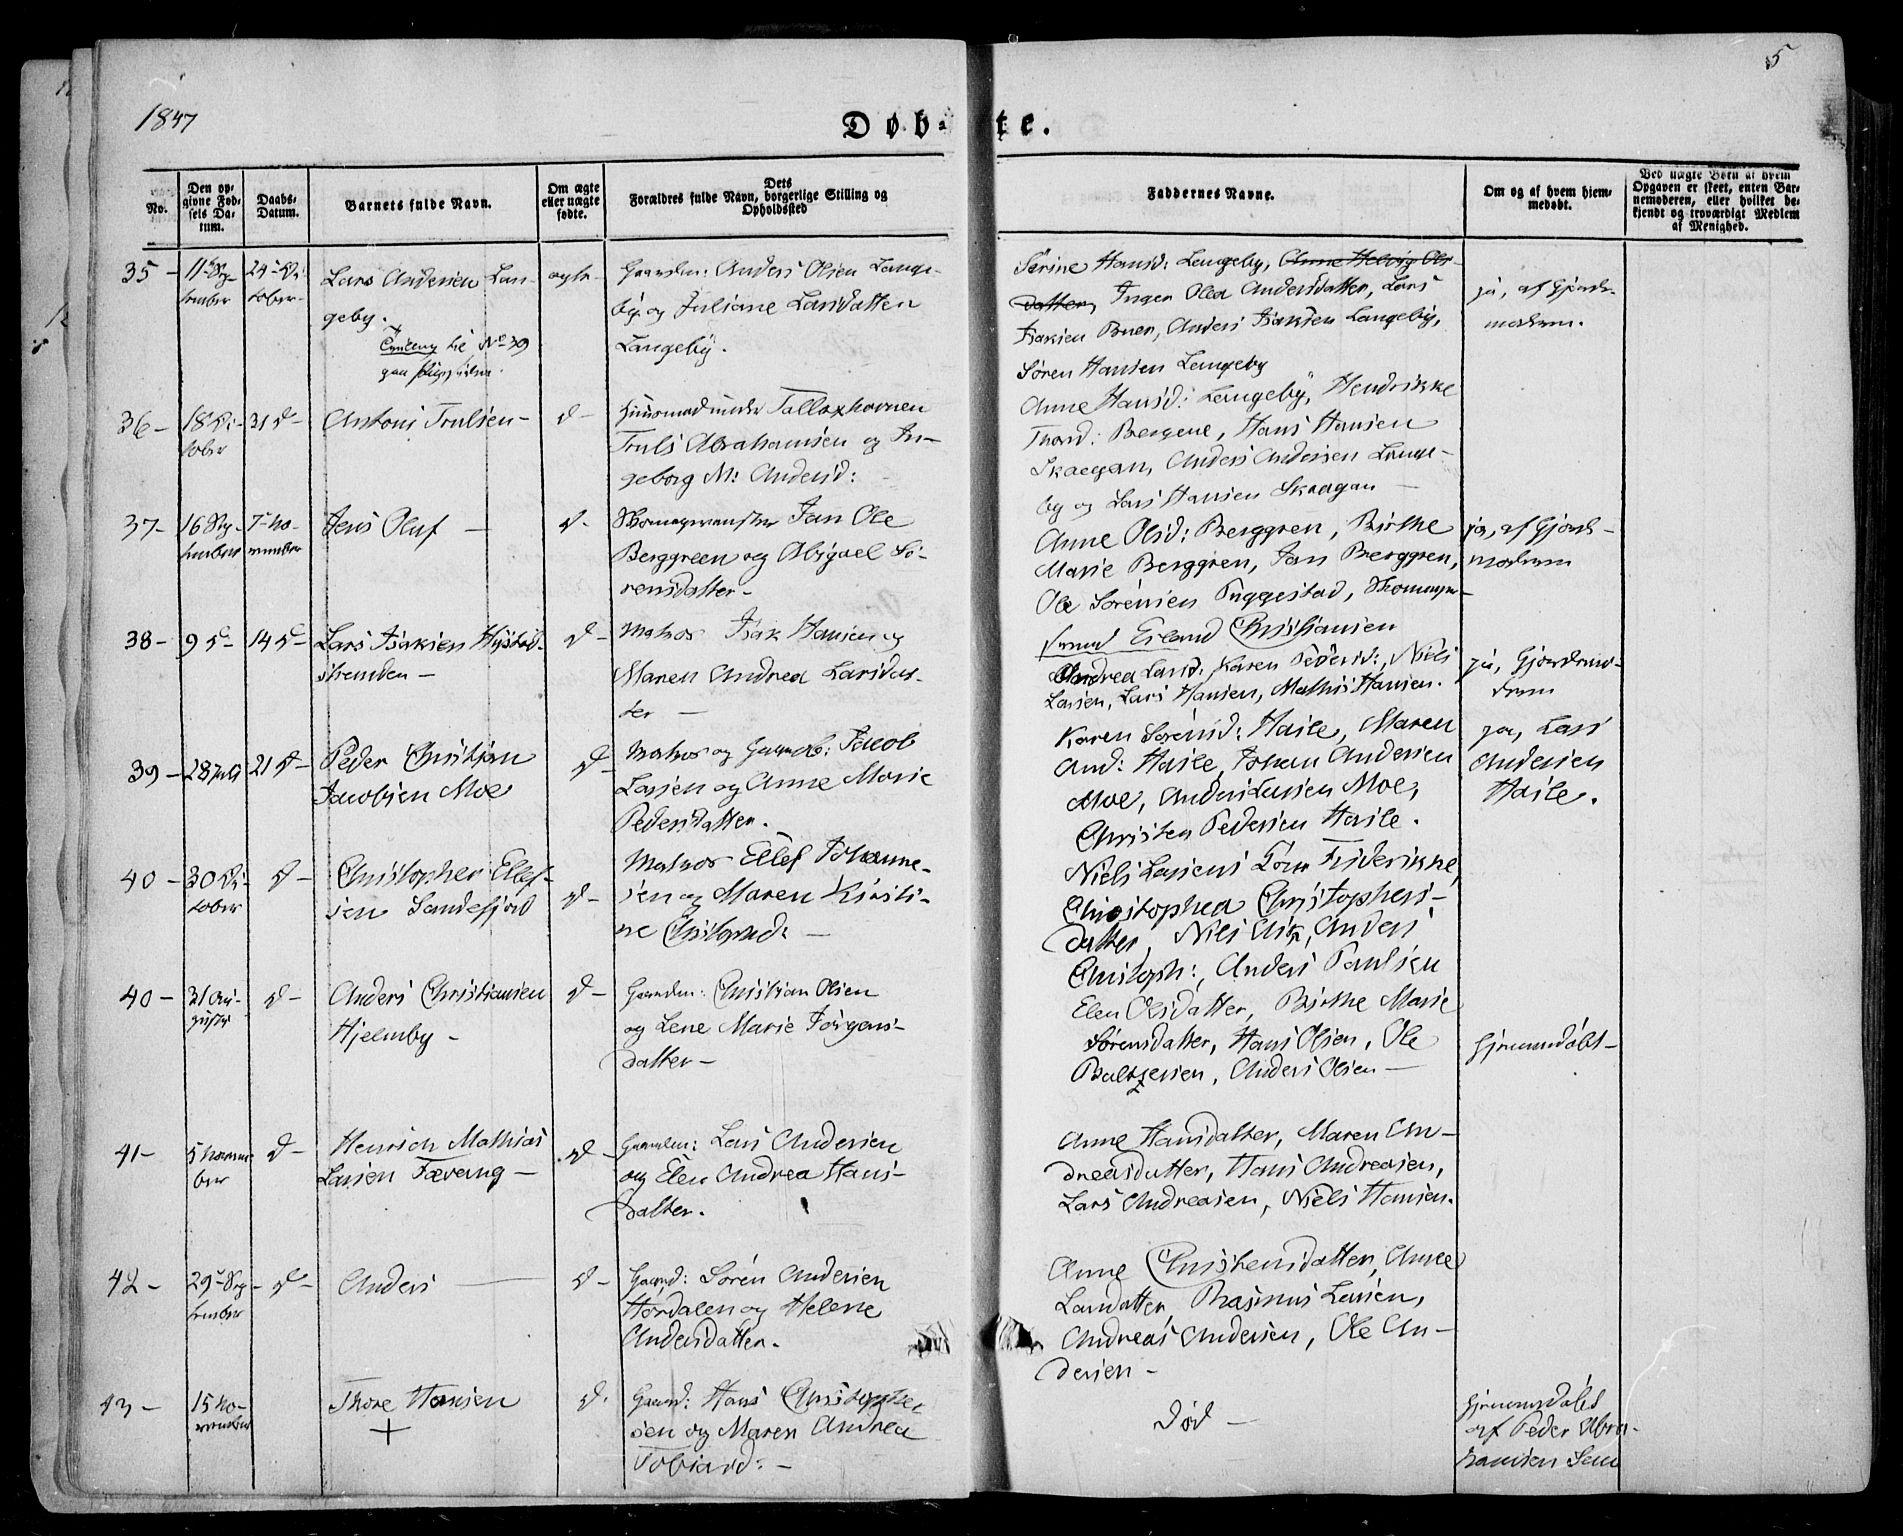 SAKO, Sandar kirkebøker, F/Fa/L0006: Ministerialbok nr. 6, 1847-1860, s. 5a